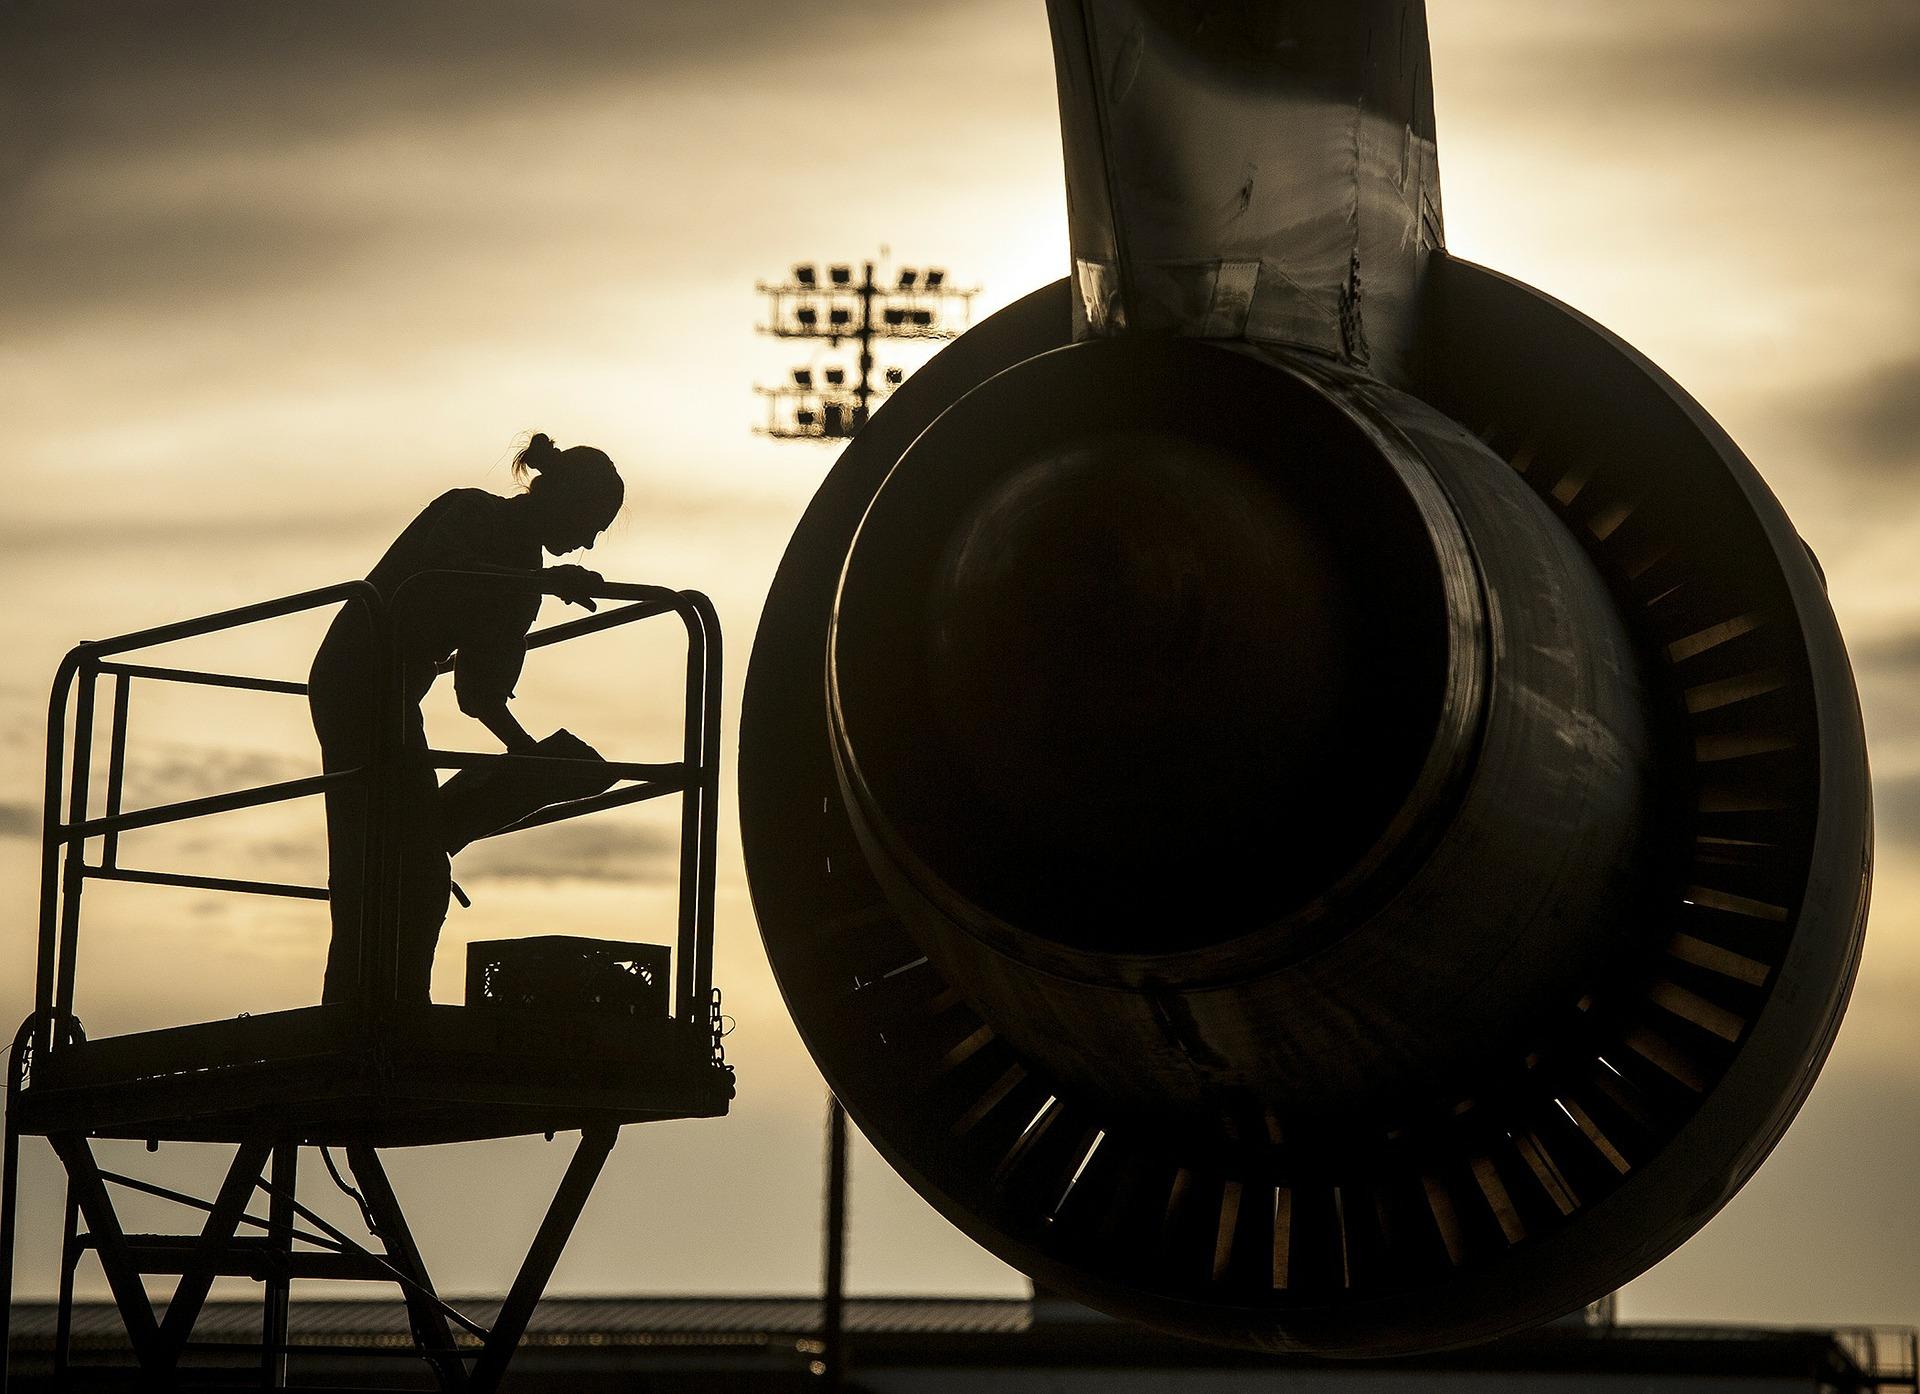 Theft of Aircraft at SeaTac